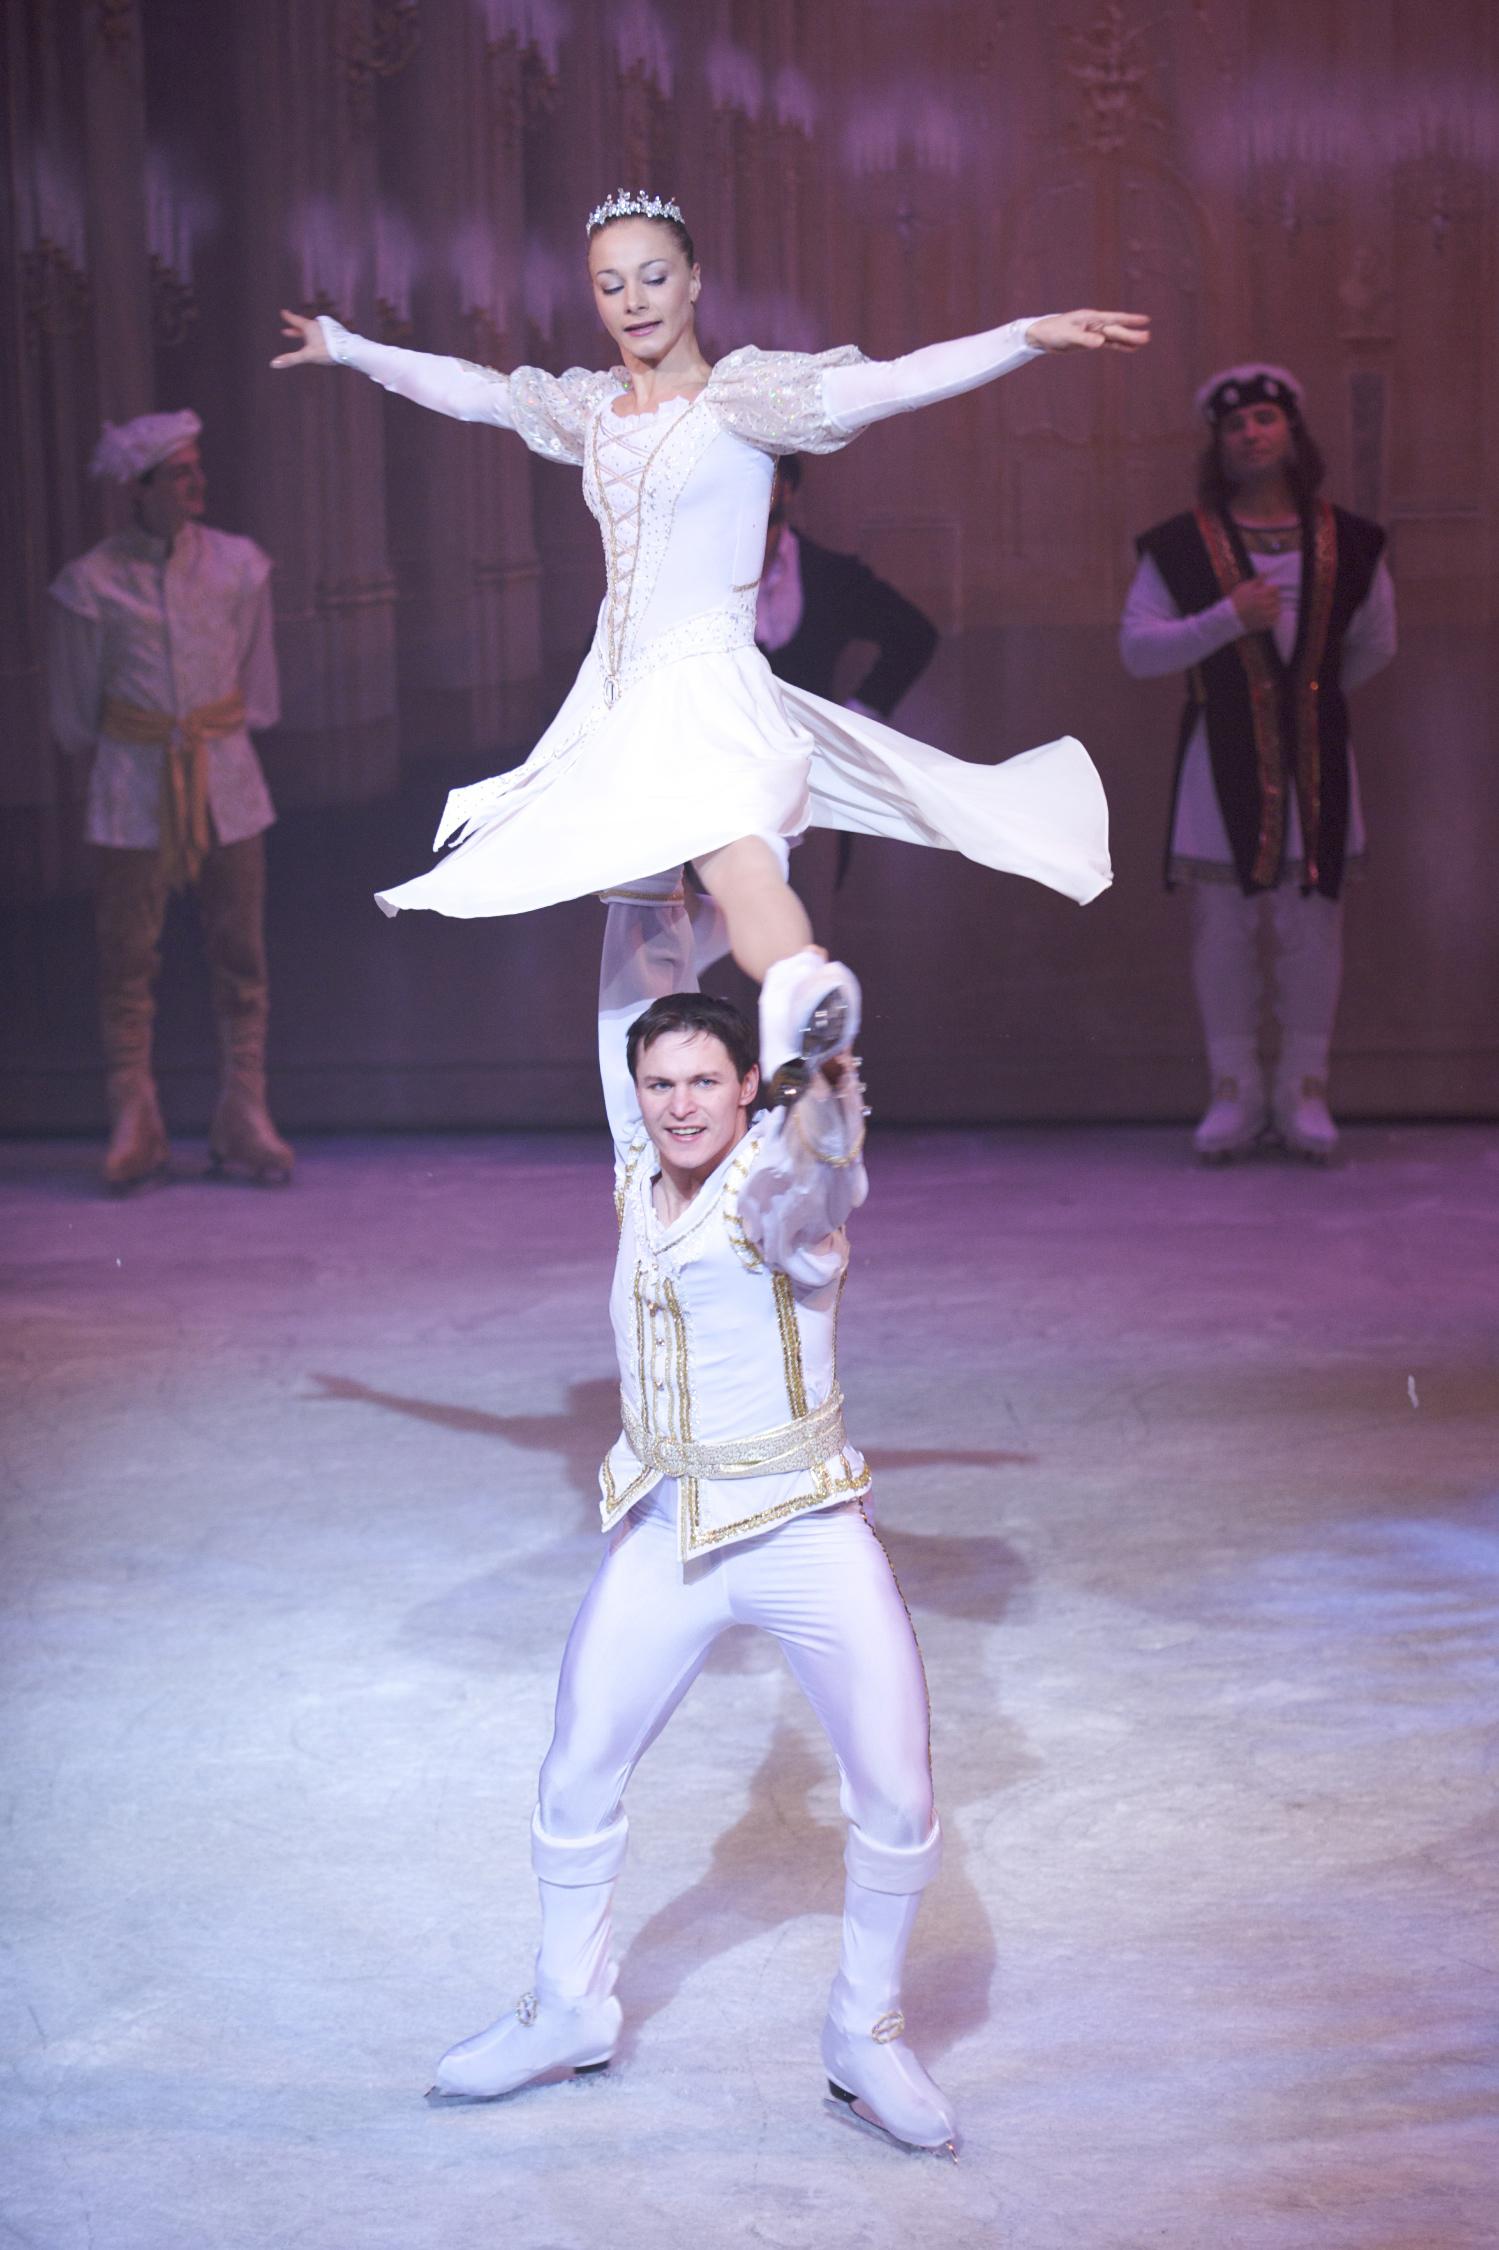 HIRES-IrinaTkachuk&ValdisMintals-SnowWhite&PrinceCharming